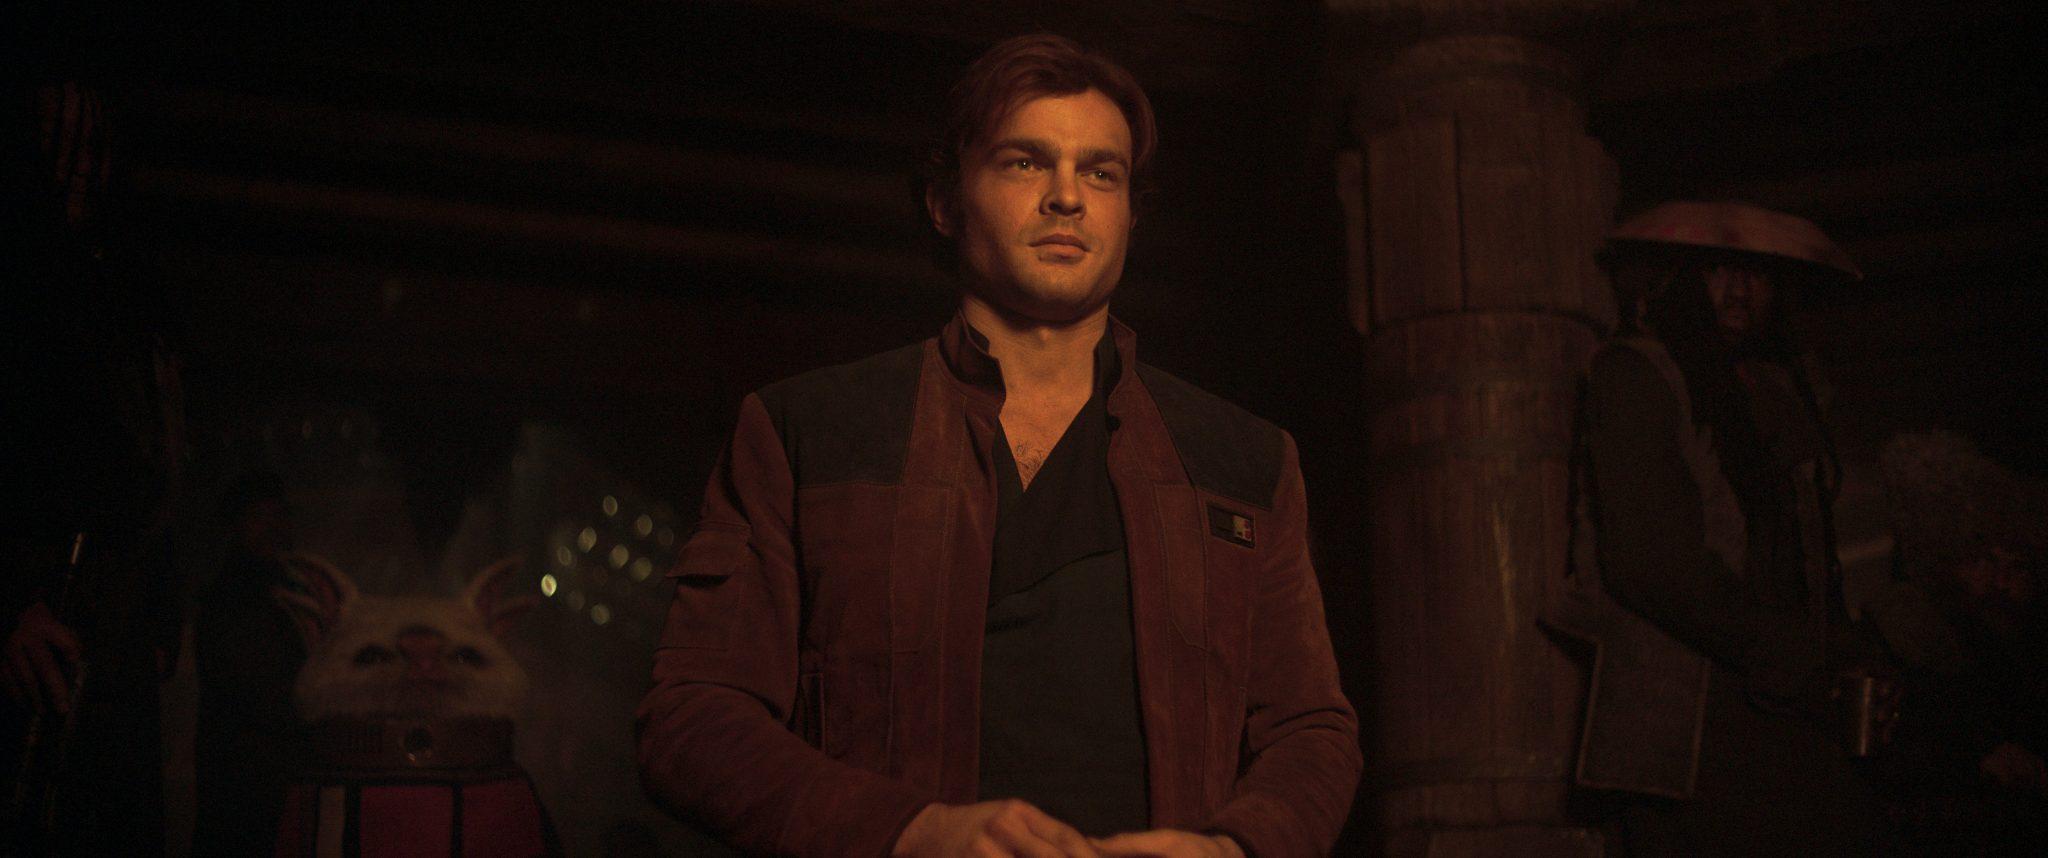 Solo A Star Wars Story Han Solo Chewbacca Chewie Spin-off Disney Test Kritik Heimkino Blu ray DVD Han